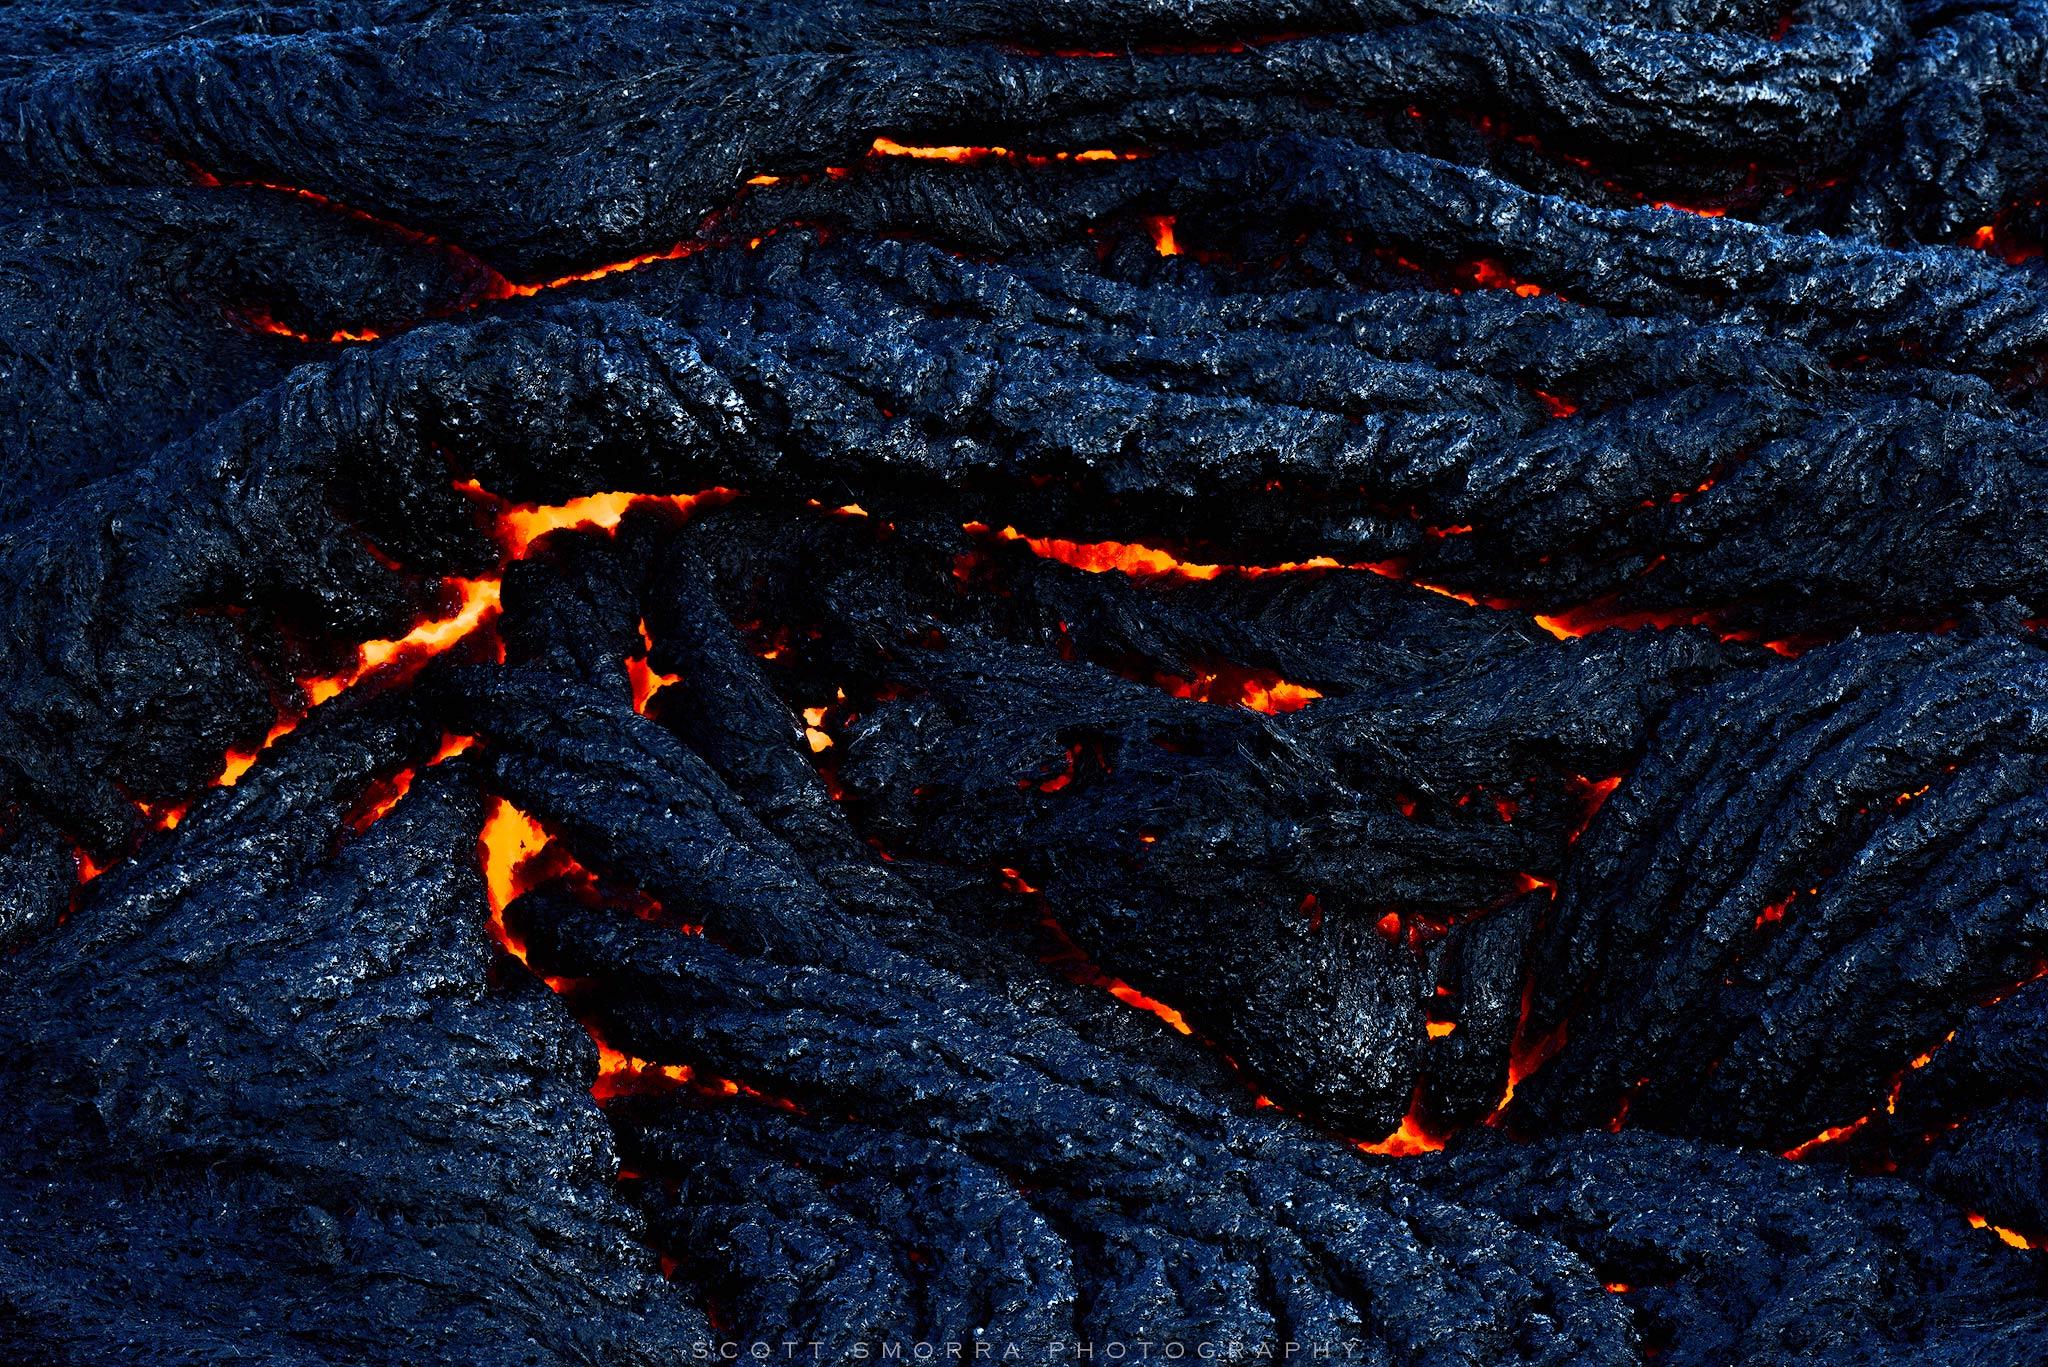 Hawaii, Big Island, Volcanoes National Park, Kilauea, 61G, Lava, flow, photo